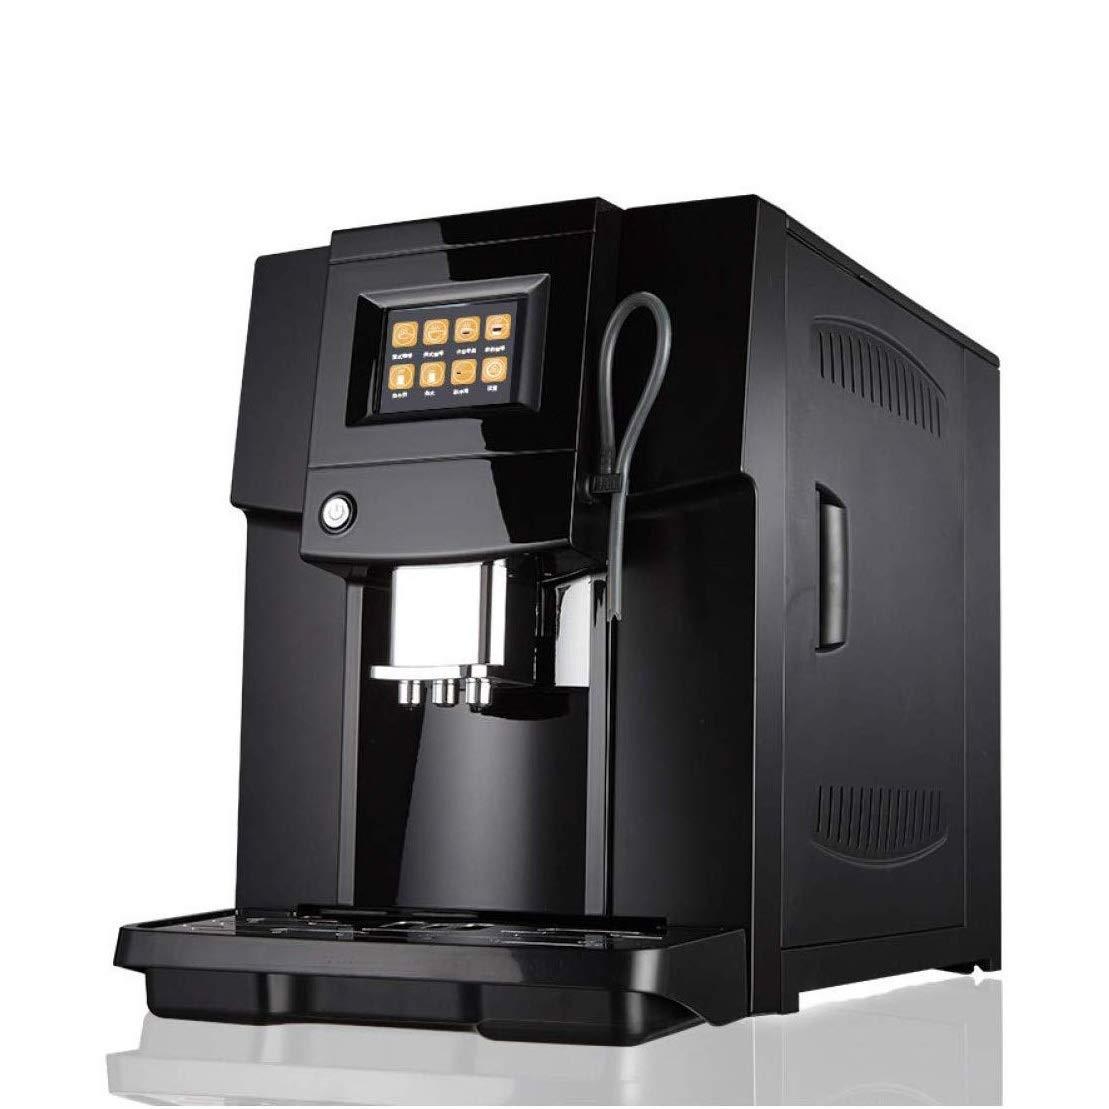 HIZLJJ Solo sirven café Cafetera Brewer Compatible con K-Cup ...